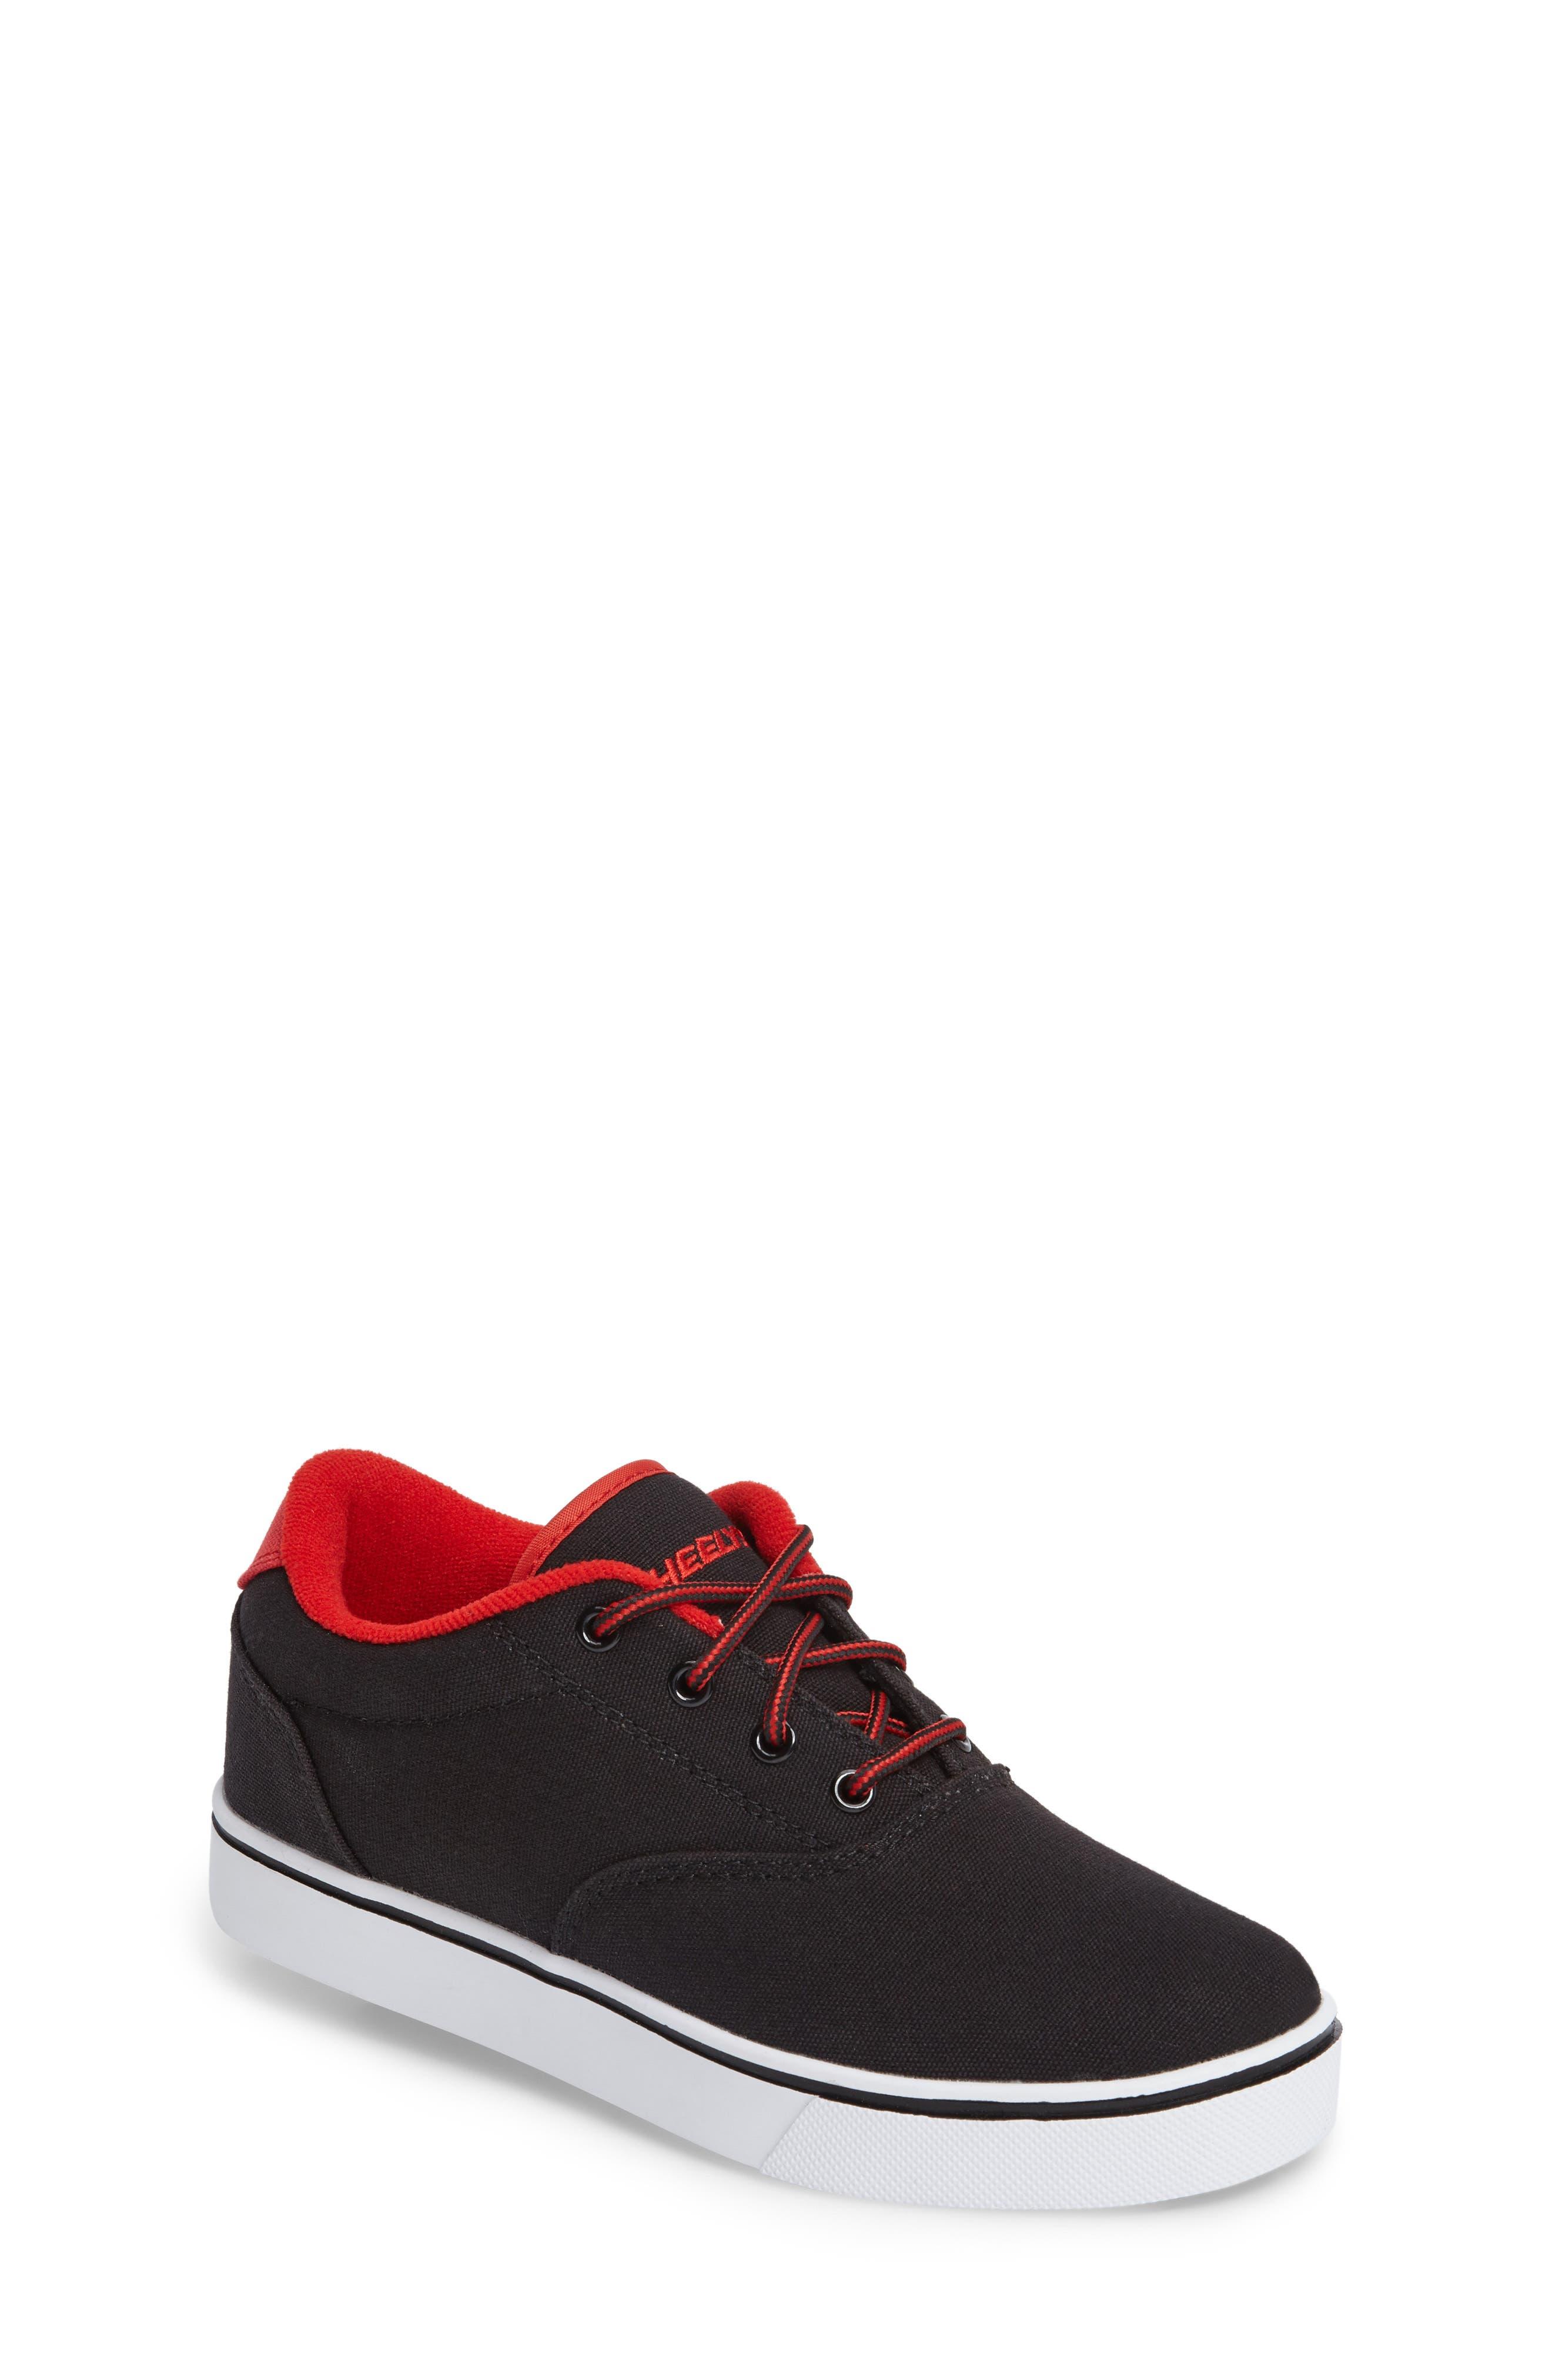 HEELYS Launch Skate Sneaker